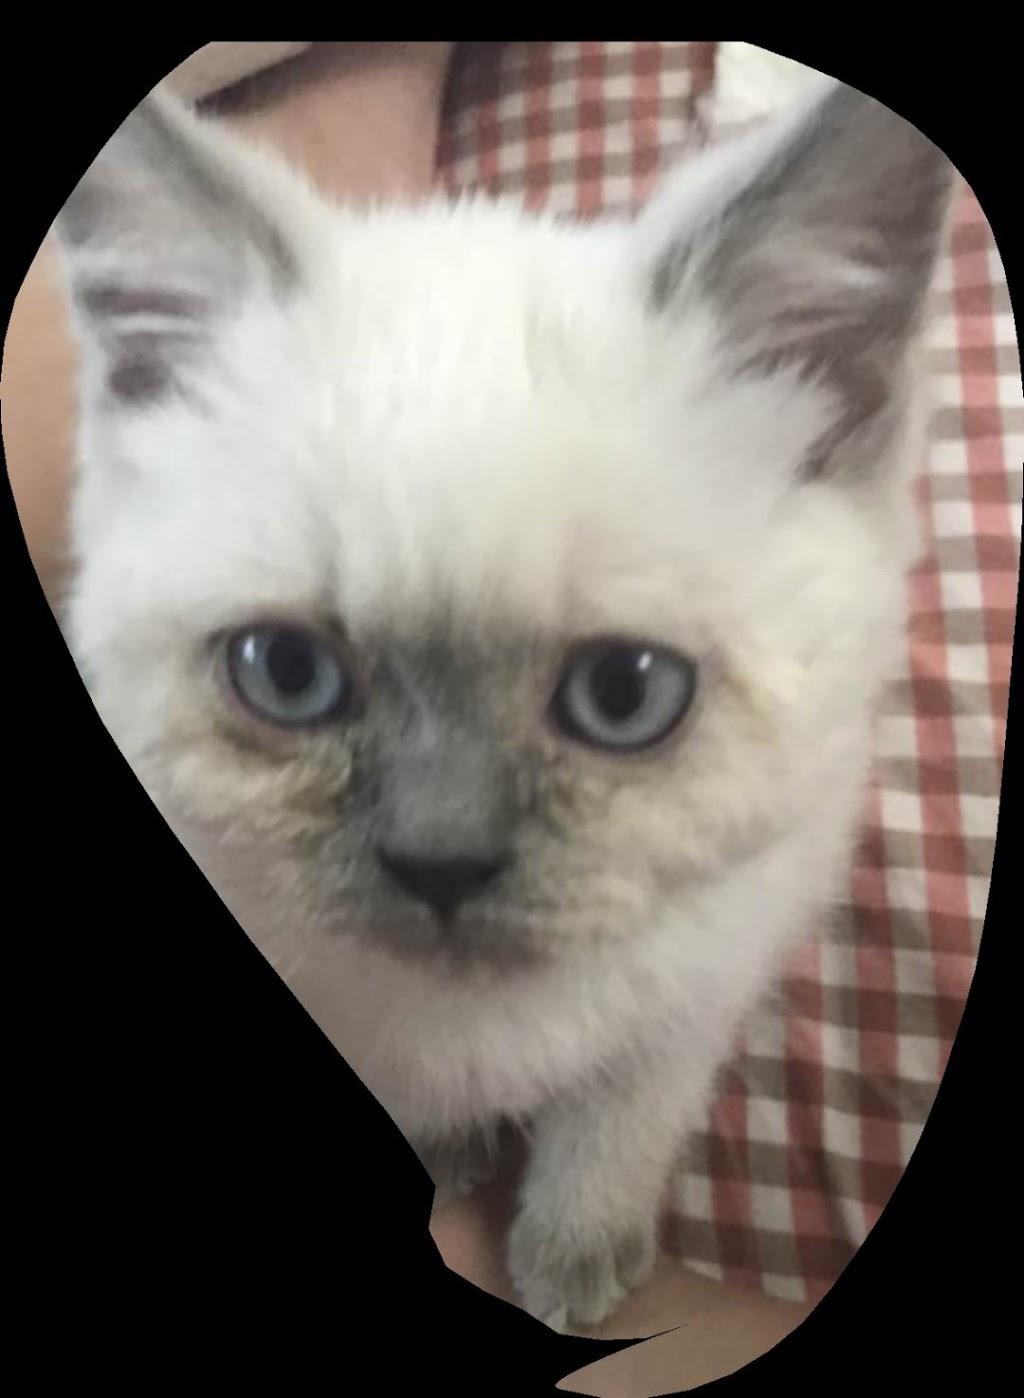 Ashcott Veterinary Clinic | veterinary care | 4915 Steeles Ave E, Scarborough, ON M1V 4Z4, Canada | 4167542837 OR +1 416-754-2837